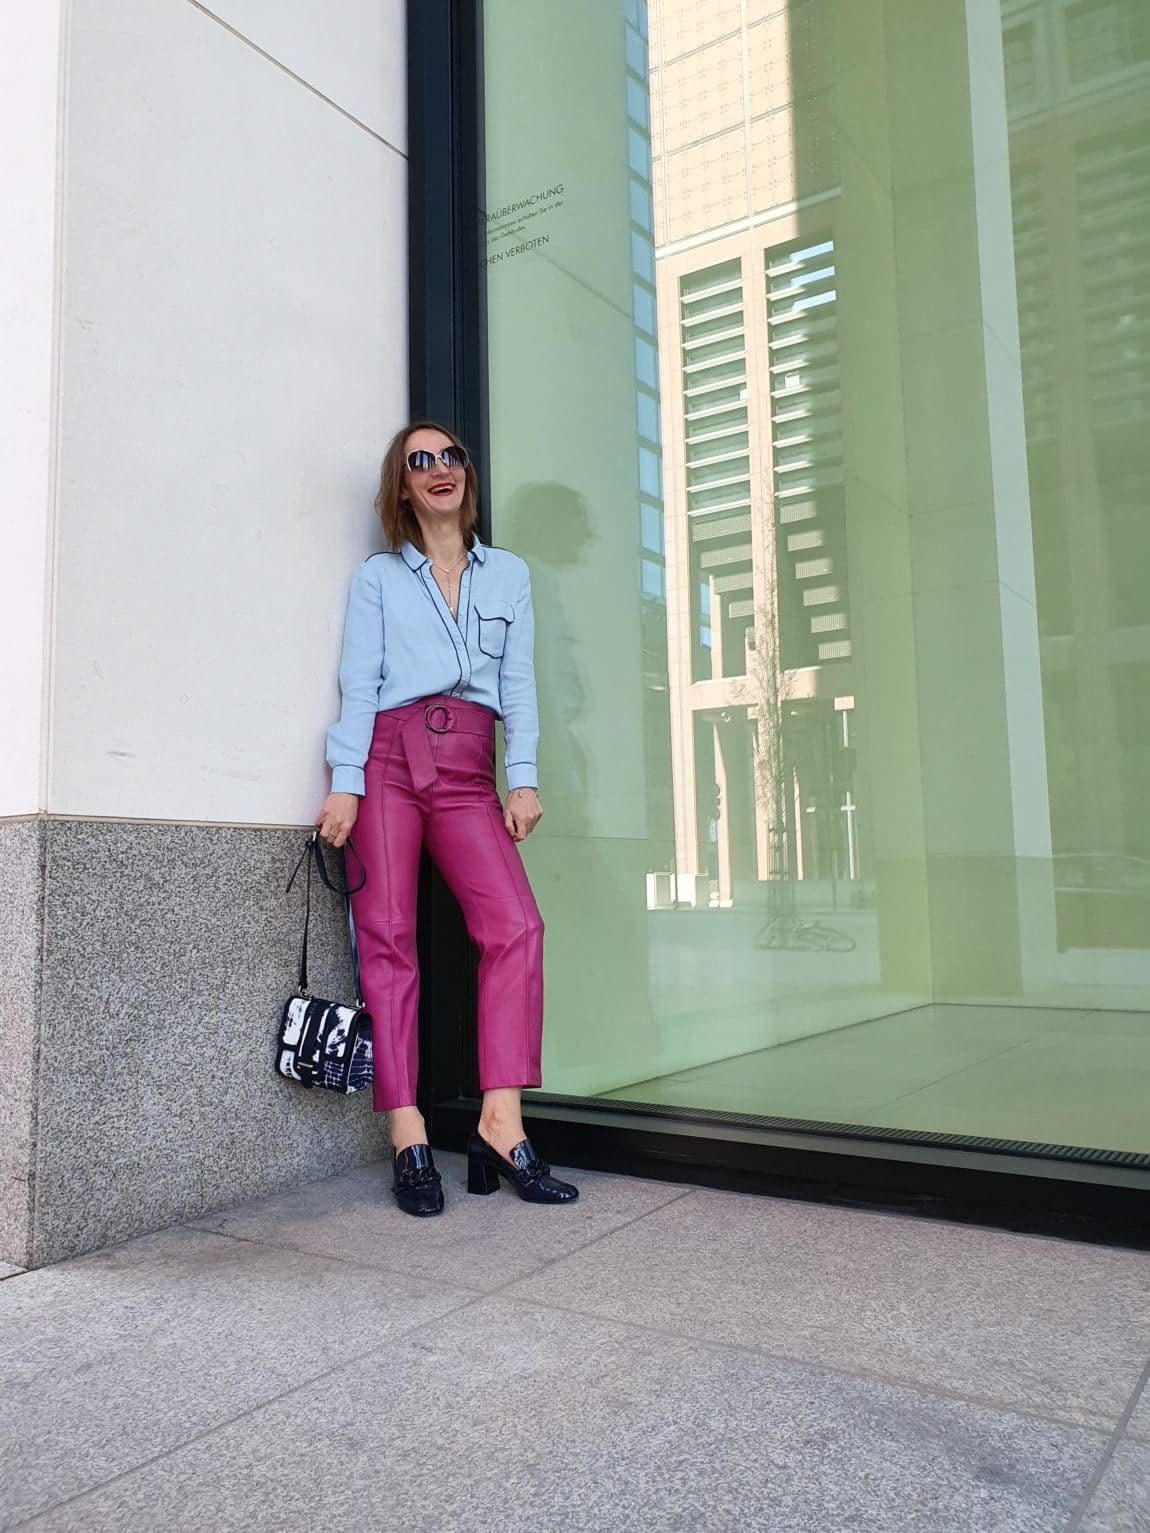 lebensfreude-finden-positive-stimmung_lederhose-pink-blog-oceanblue-style.jpg